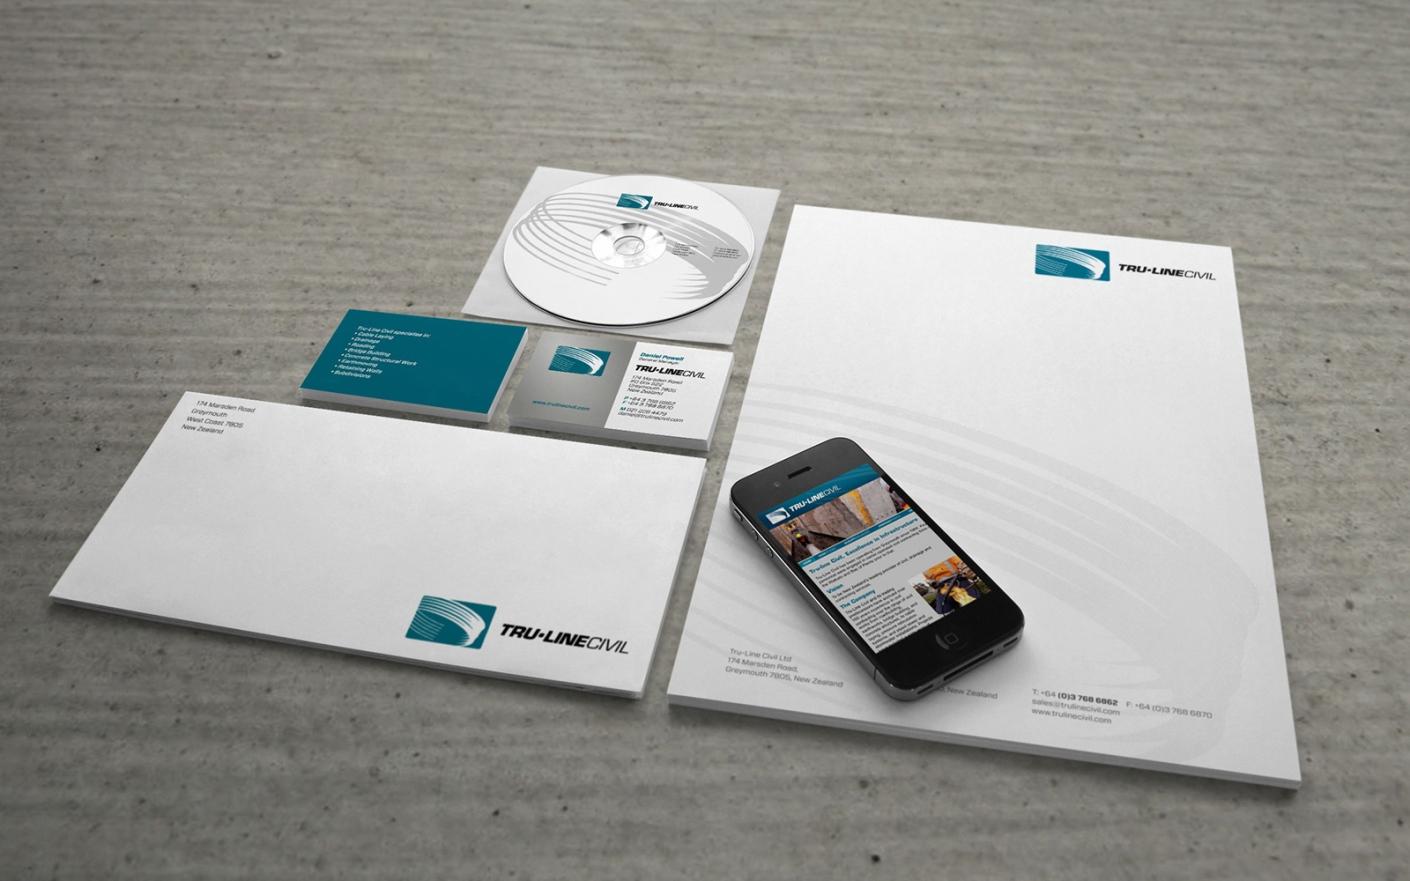 Tru-Line Civil, corporate stationery system, business card, letterhead, mobile web, CD ROM, envelope, website